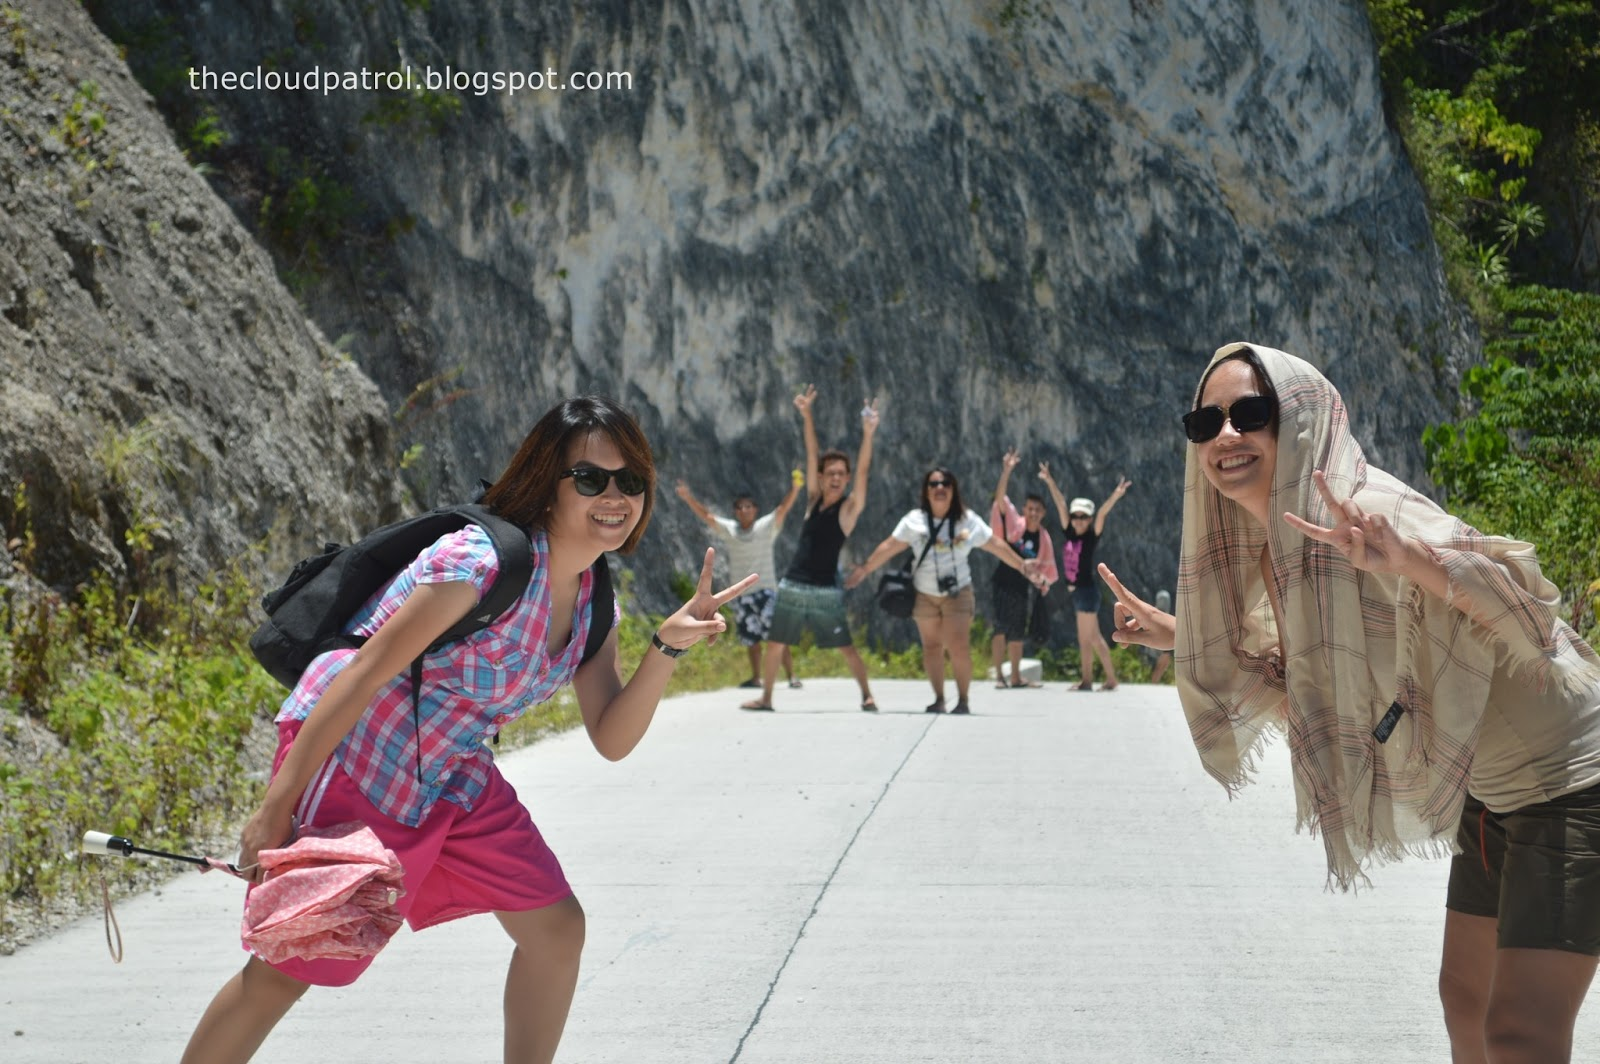 Butanding, whale shark, cebu, oslob, philippines, Tumalog, Waterfalls, mountain, hiking, hike, treking, trek, barkada, friends, trip